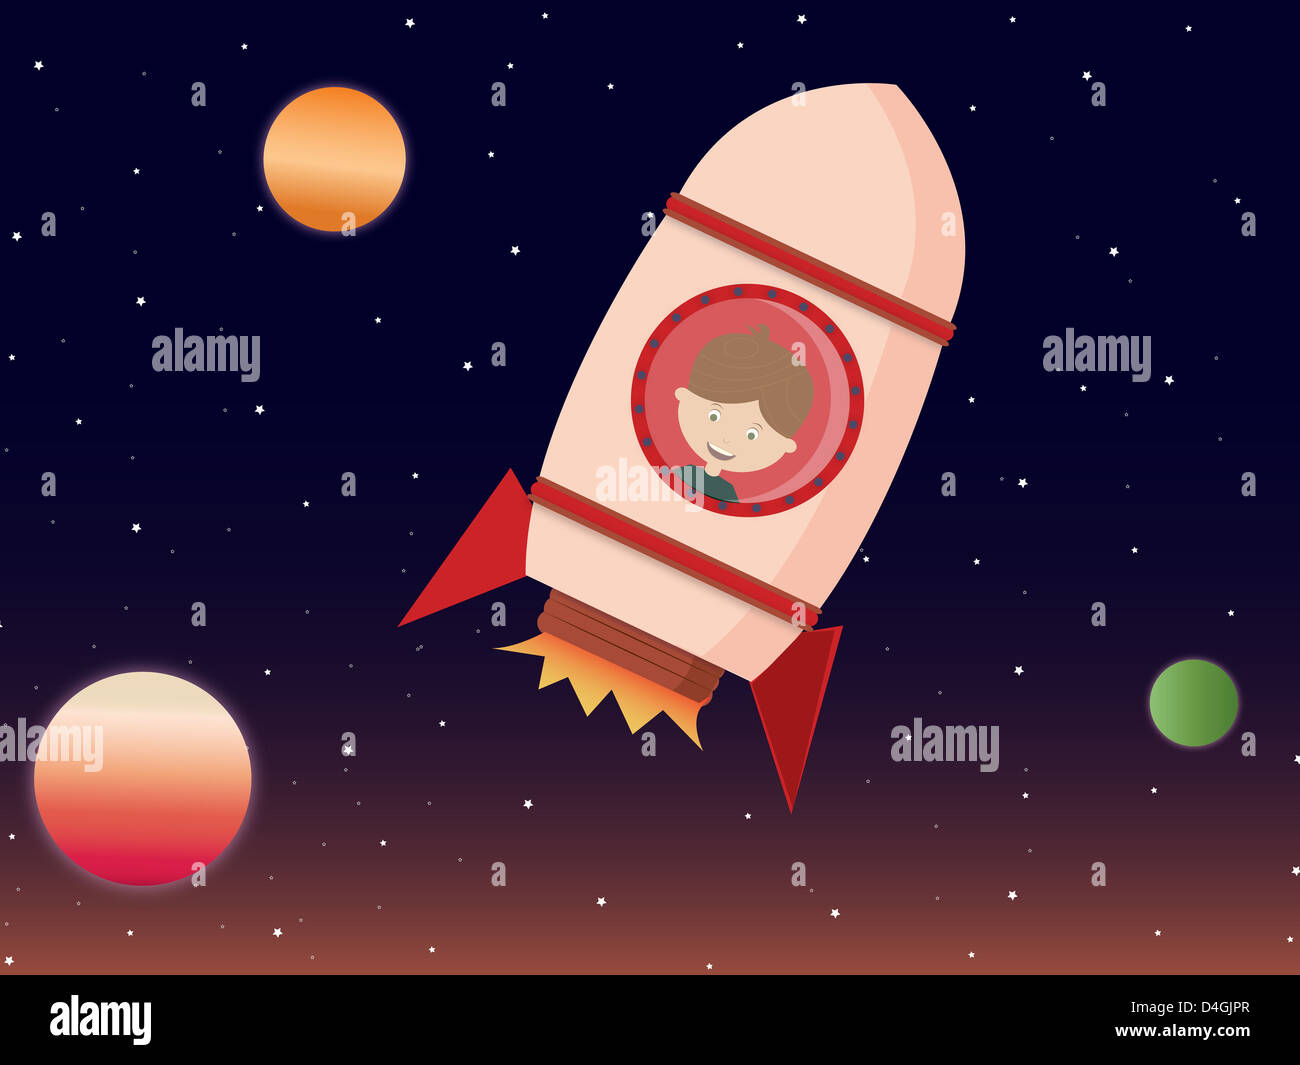 A little boy inside a rocket ship Stock Photo: 54455711 - Alamy